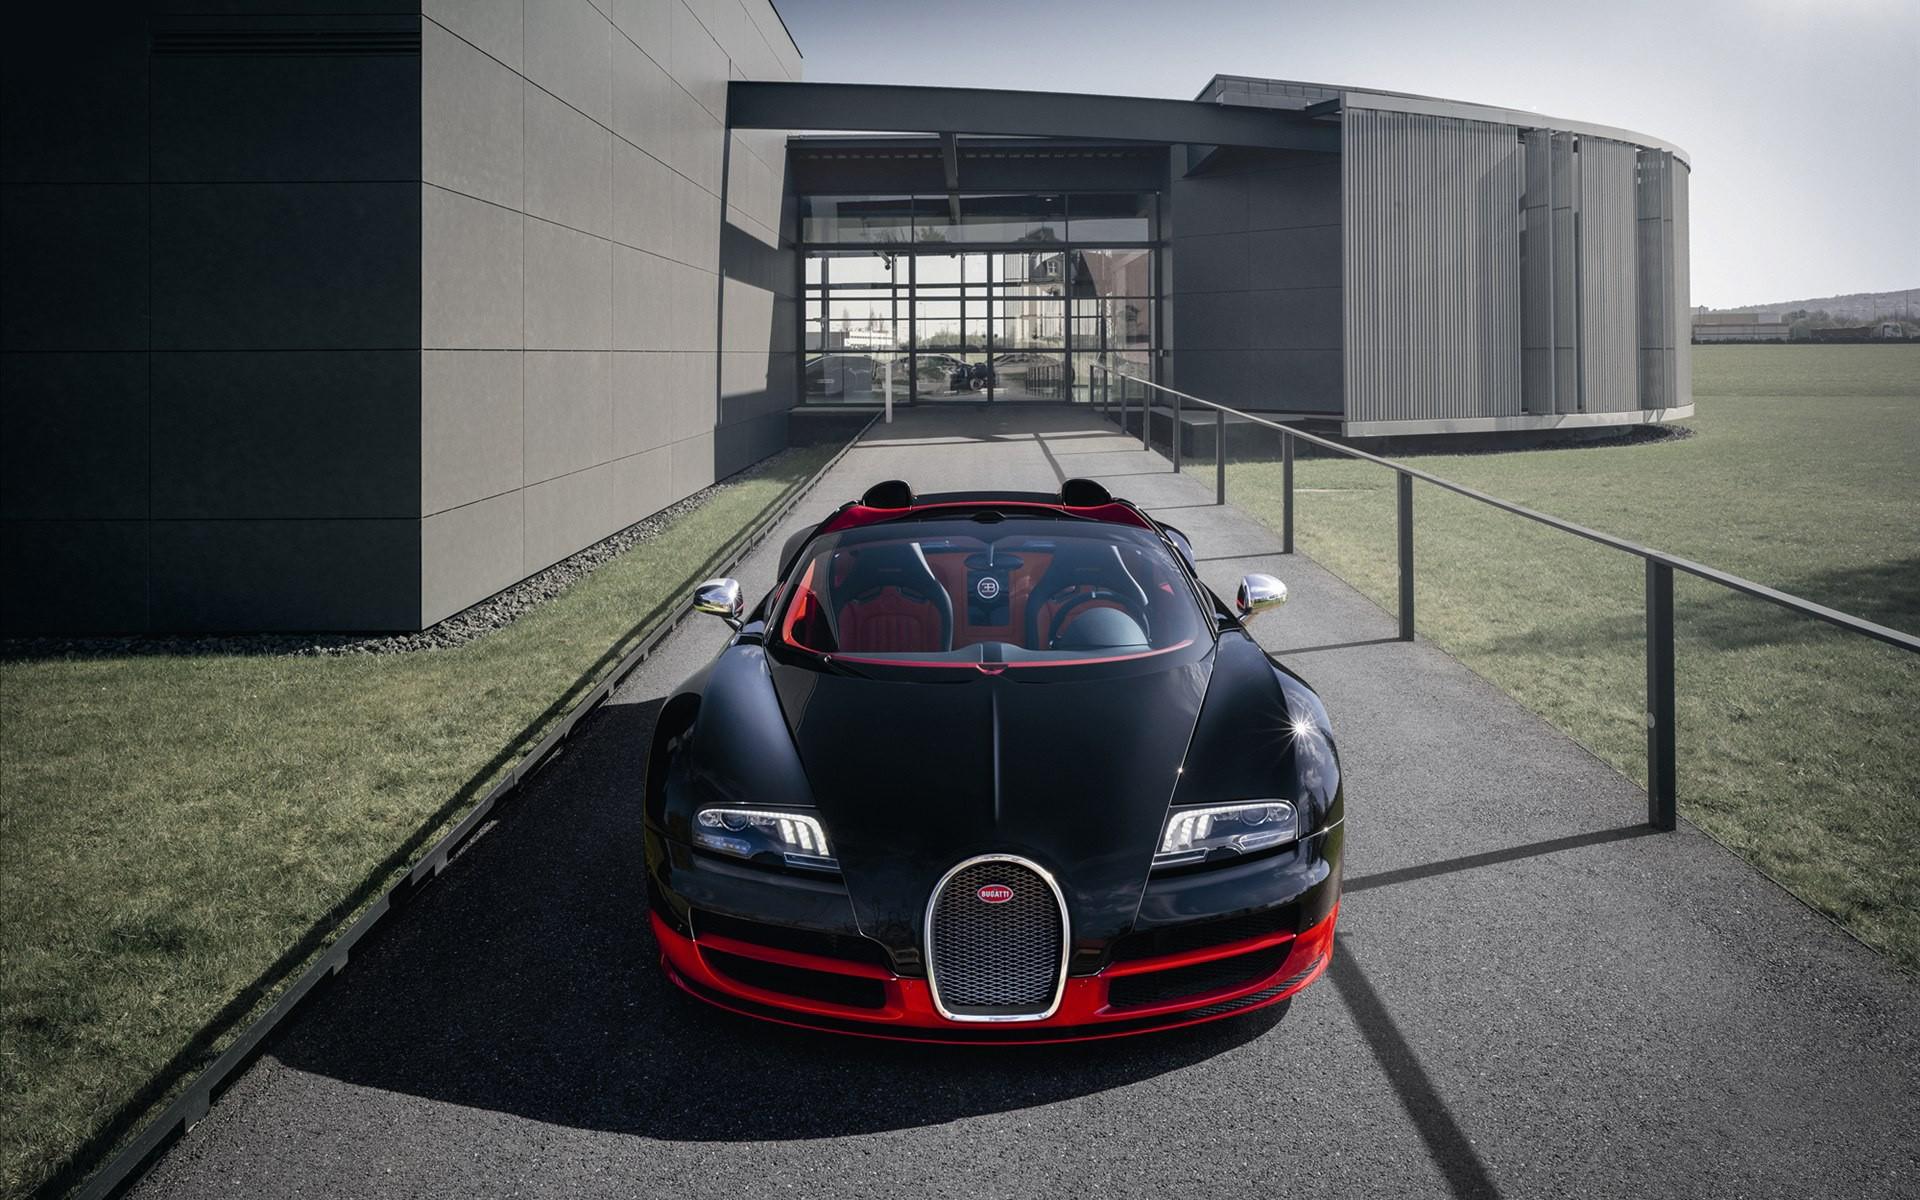 High Res Iphone X Wallpaper Bugatti Veyron Grand Sport Vitesse 2012 2 Wallpaper Hd